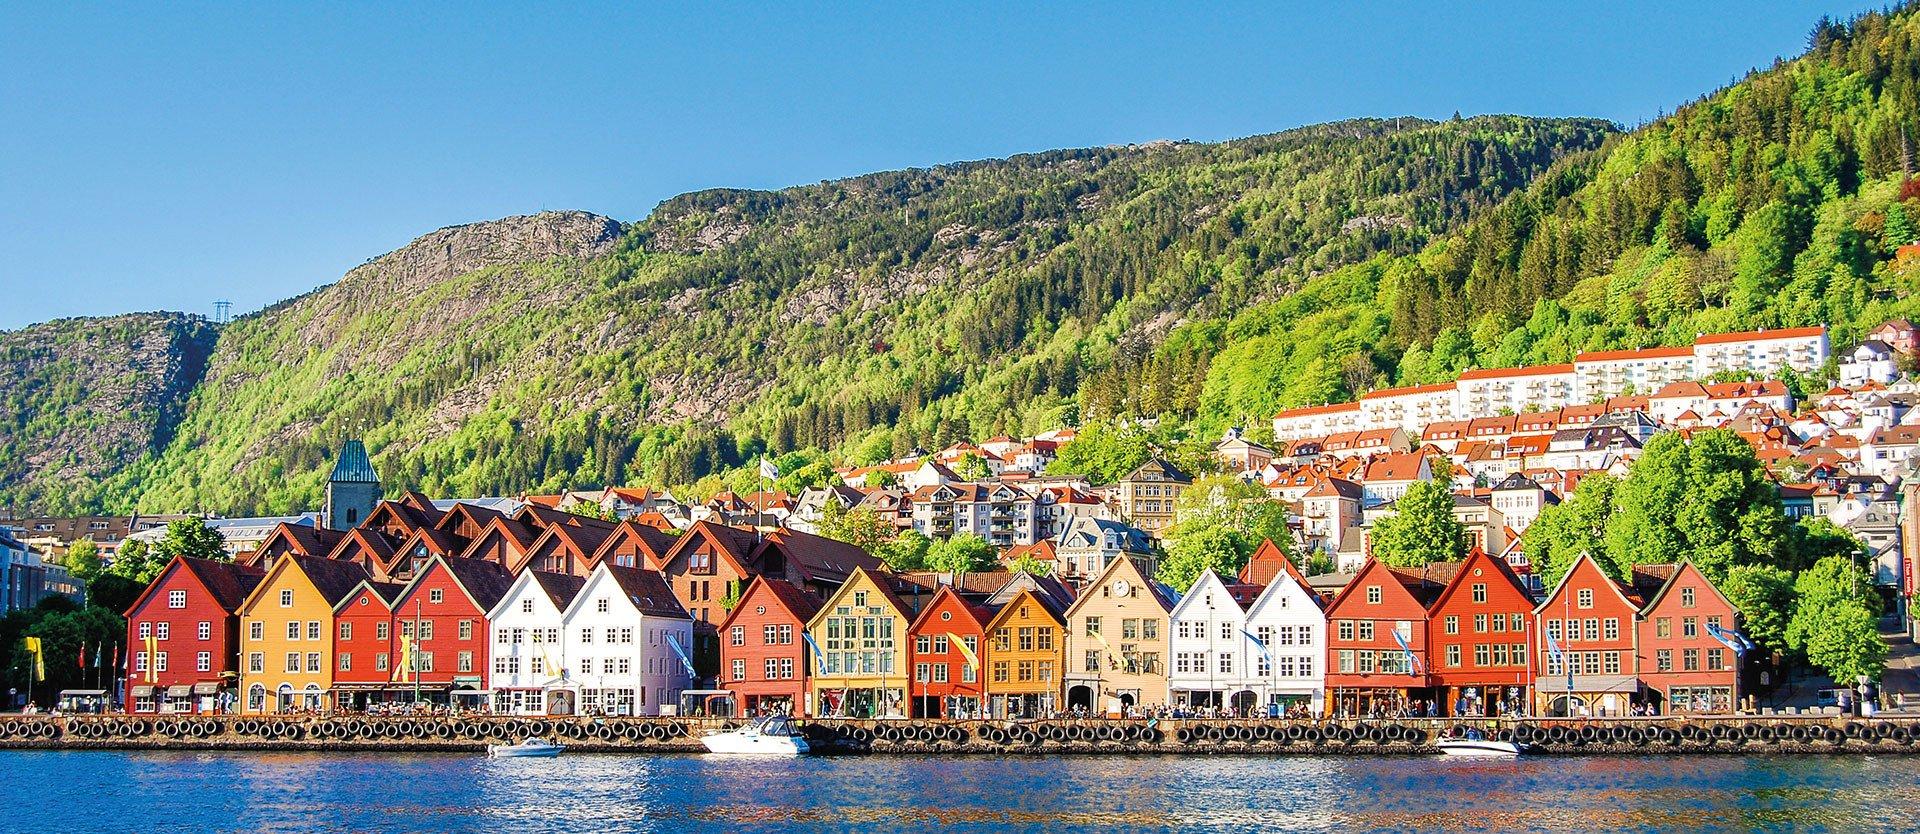 Skandinavische Häuserreihe am Fjord